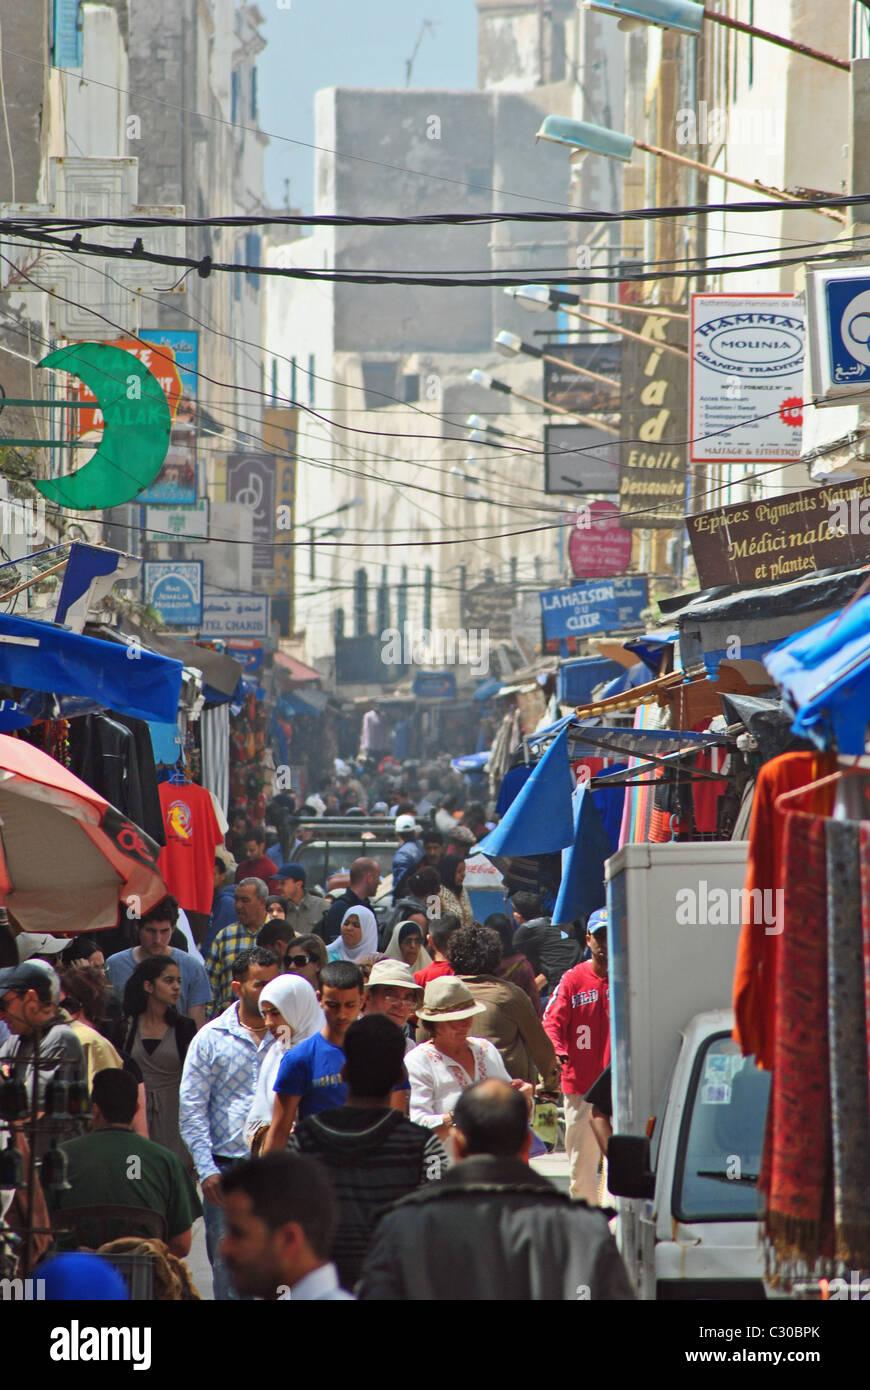 Busy street in the medina of Essouira, Morocco - Stock Image